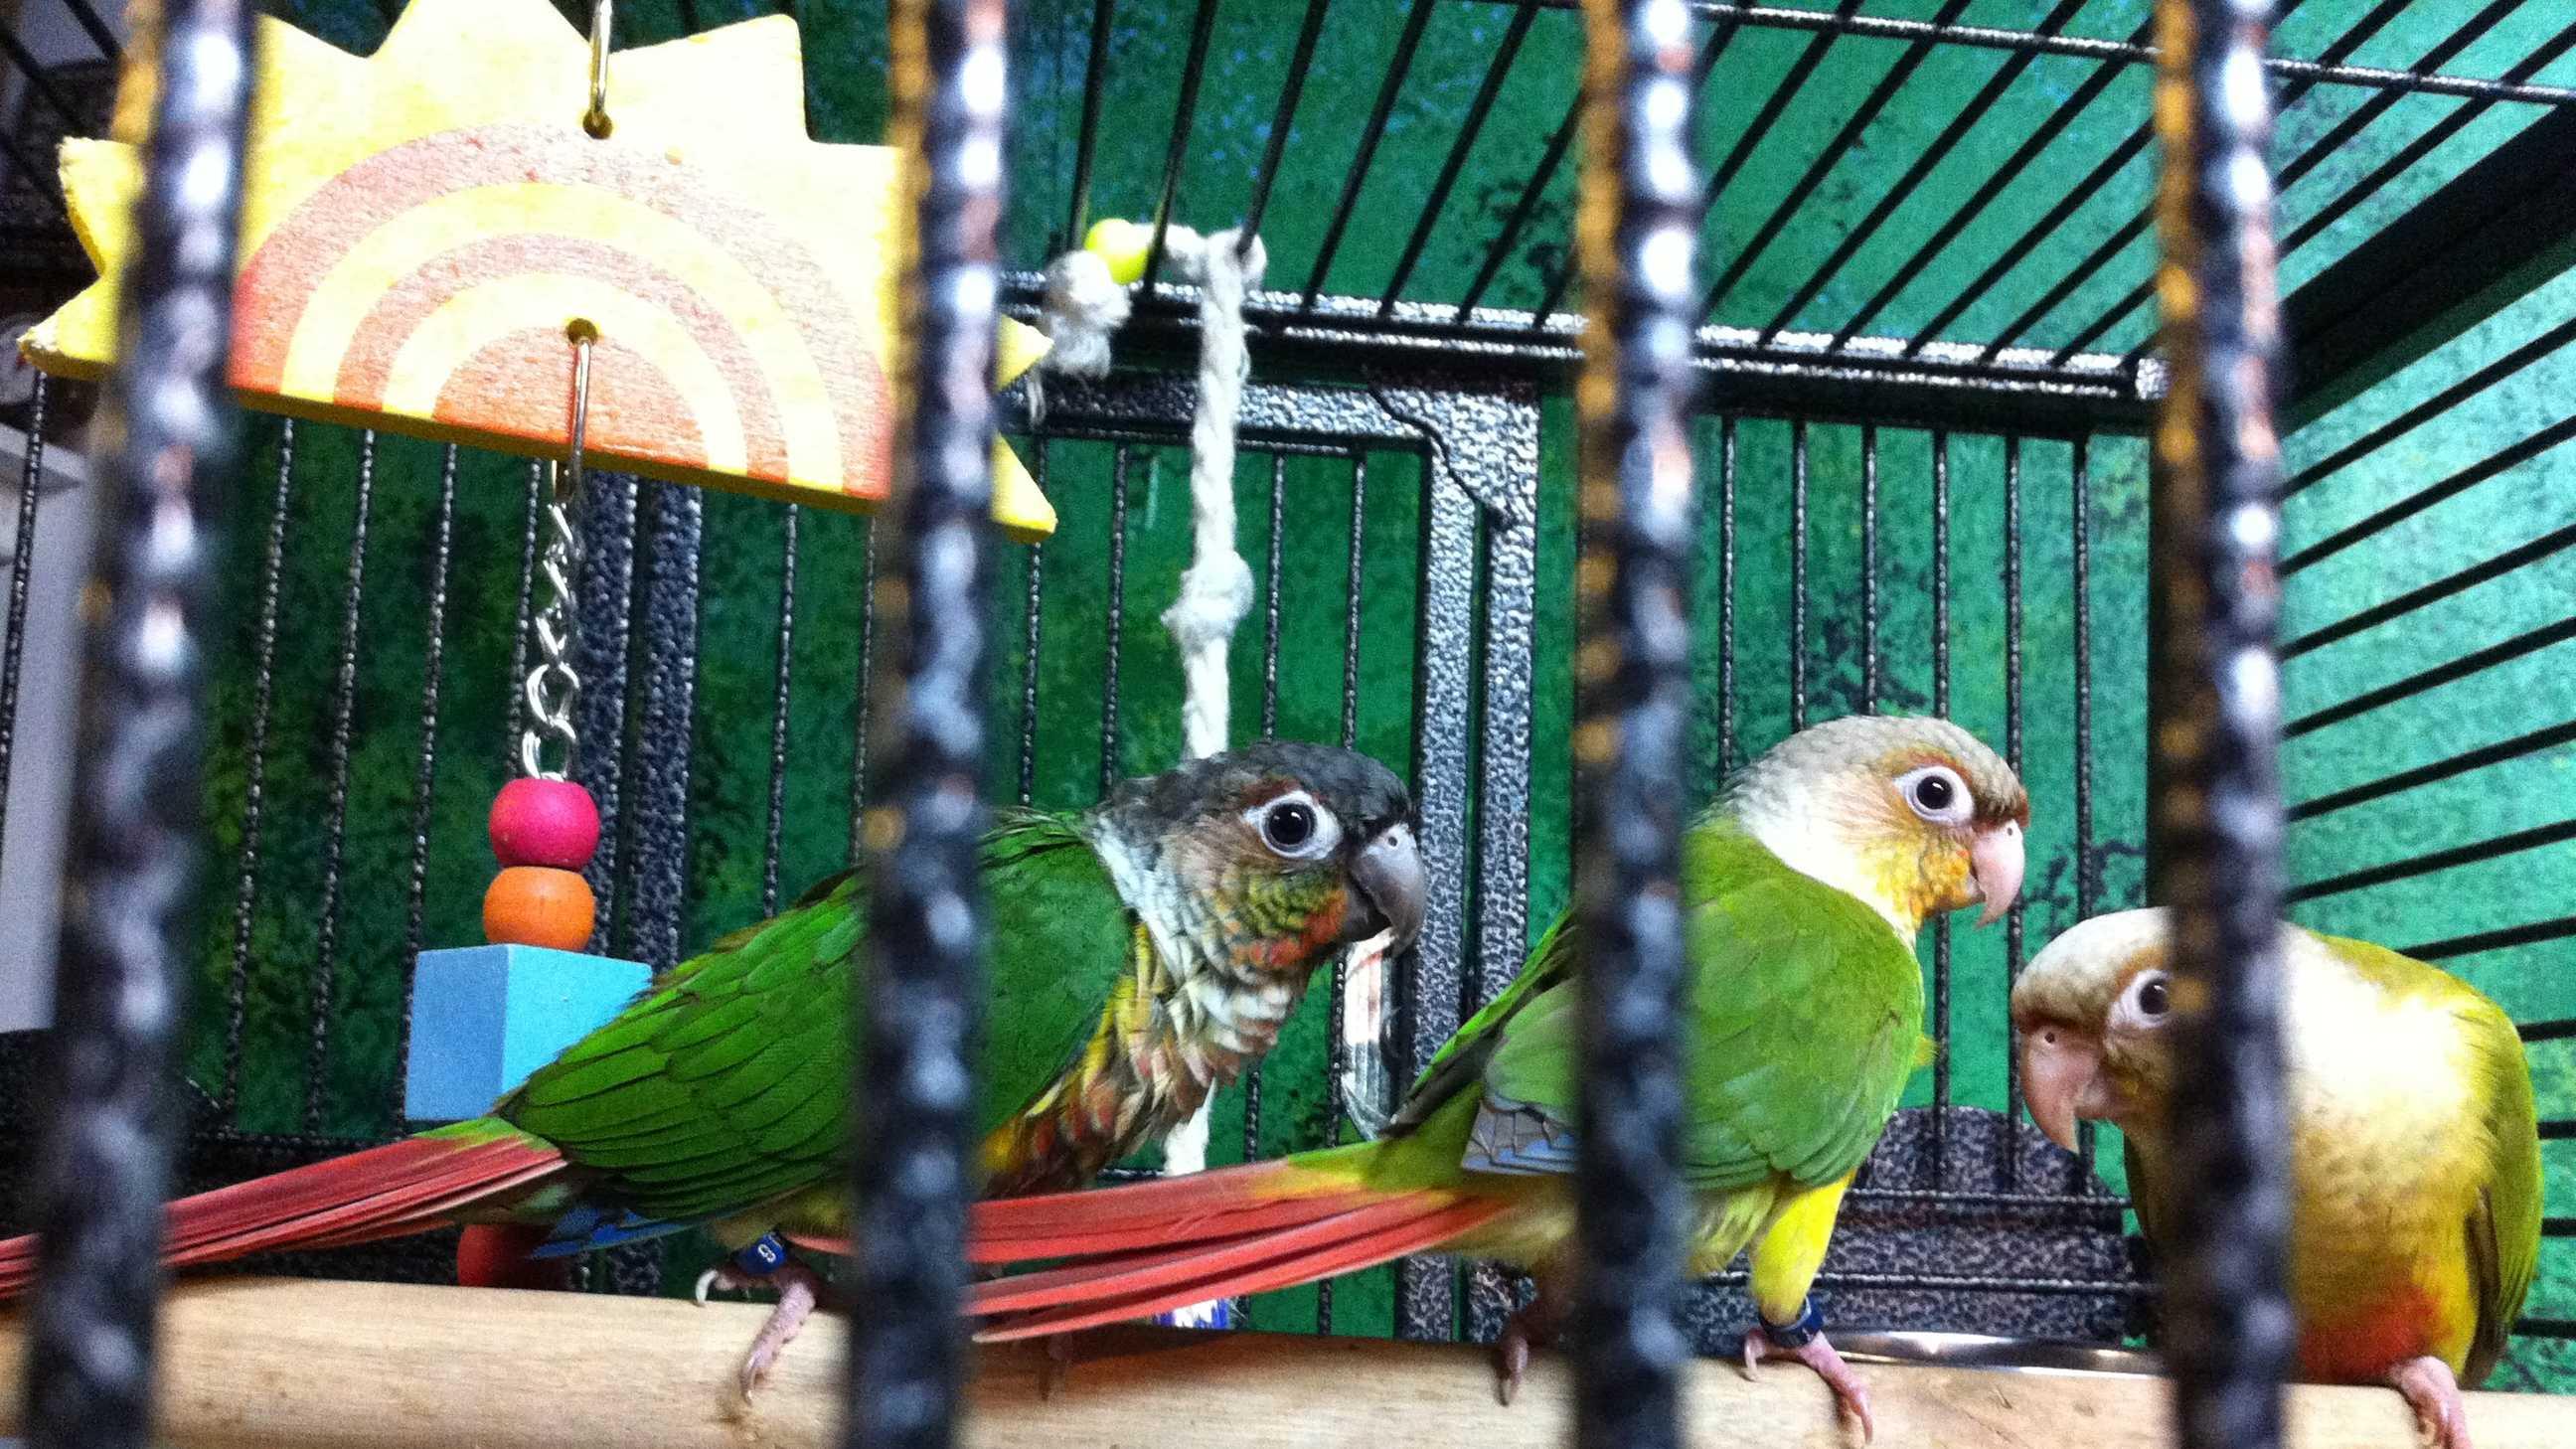 Rare parrot stolen from pet store